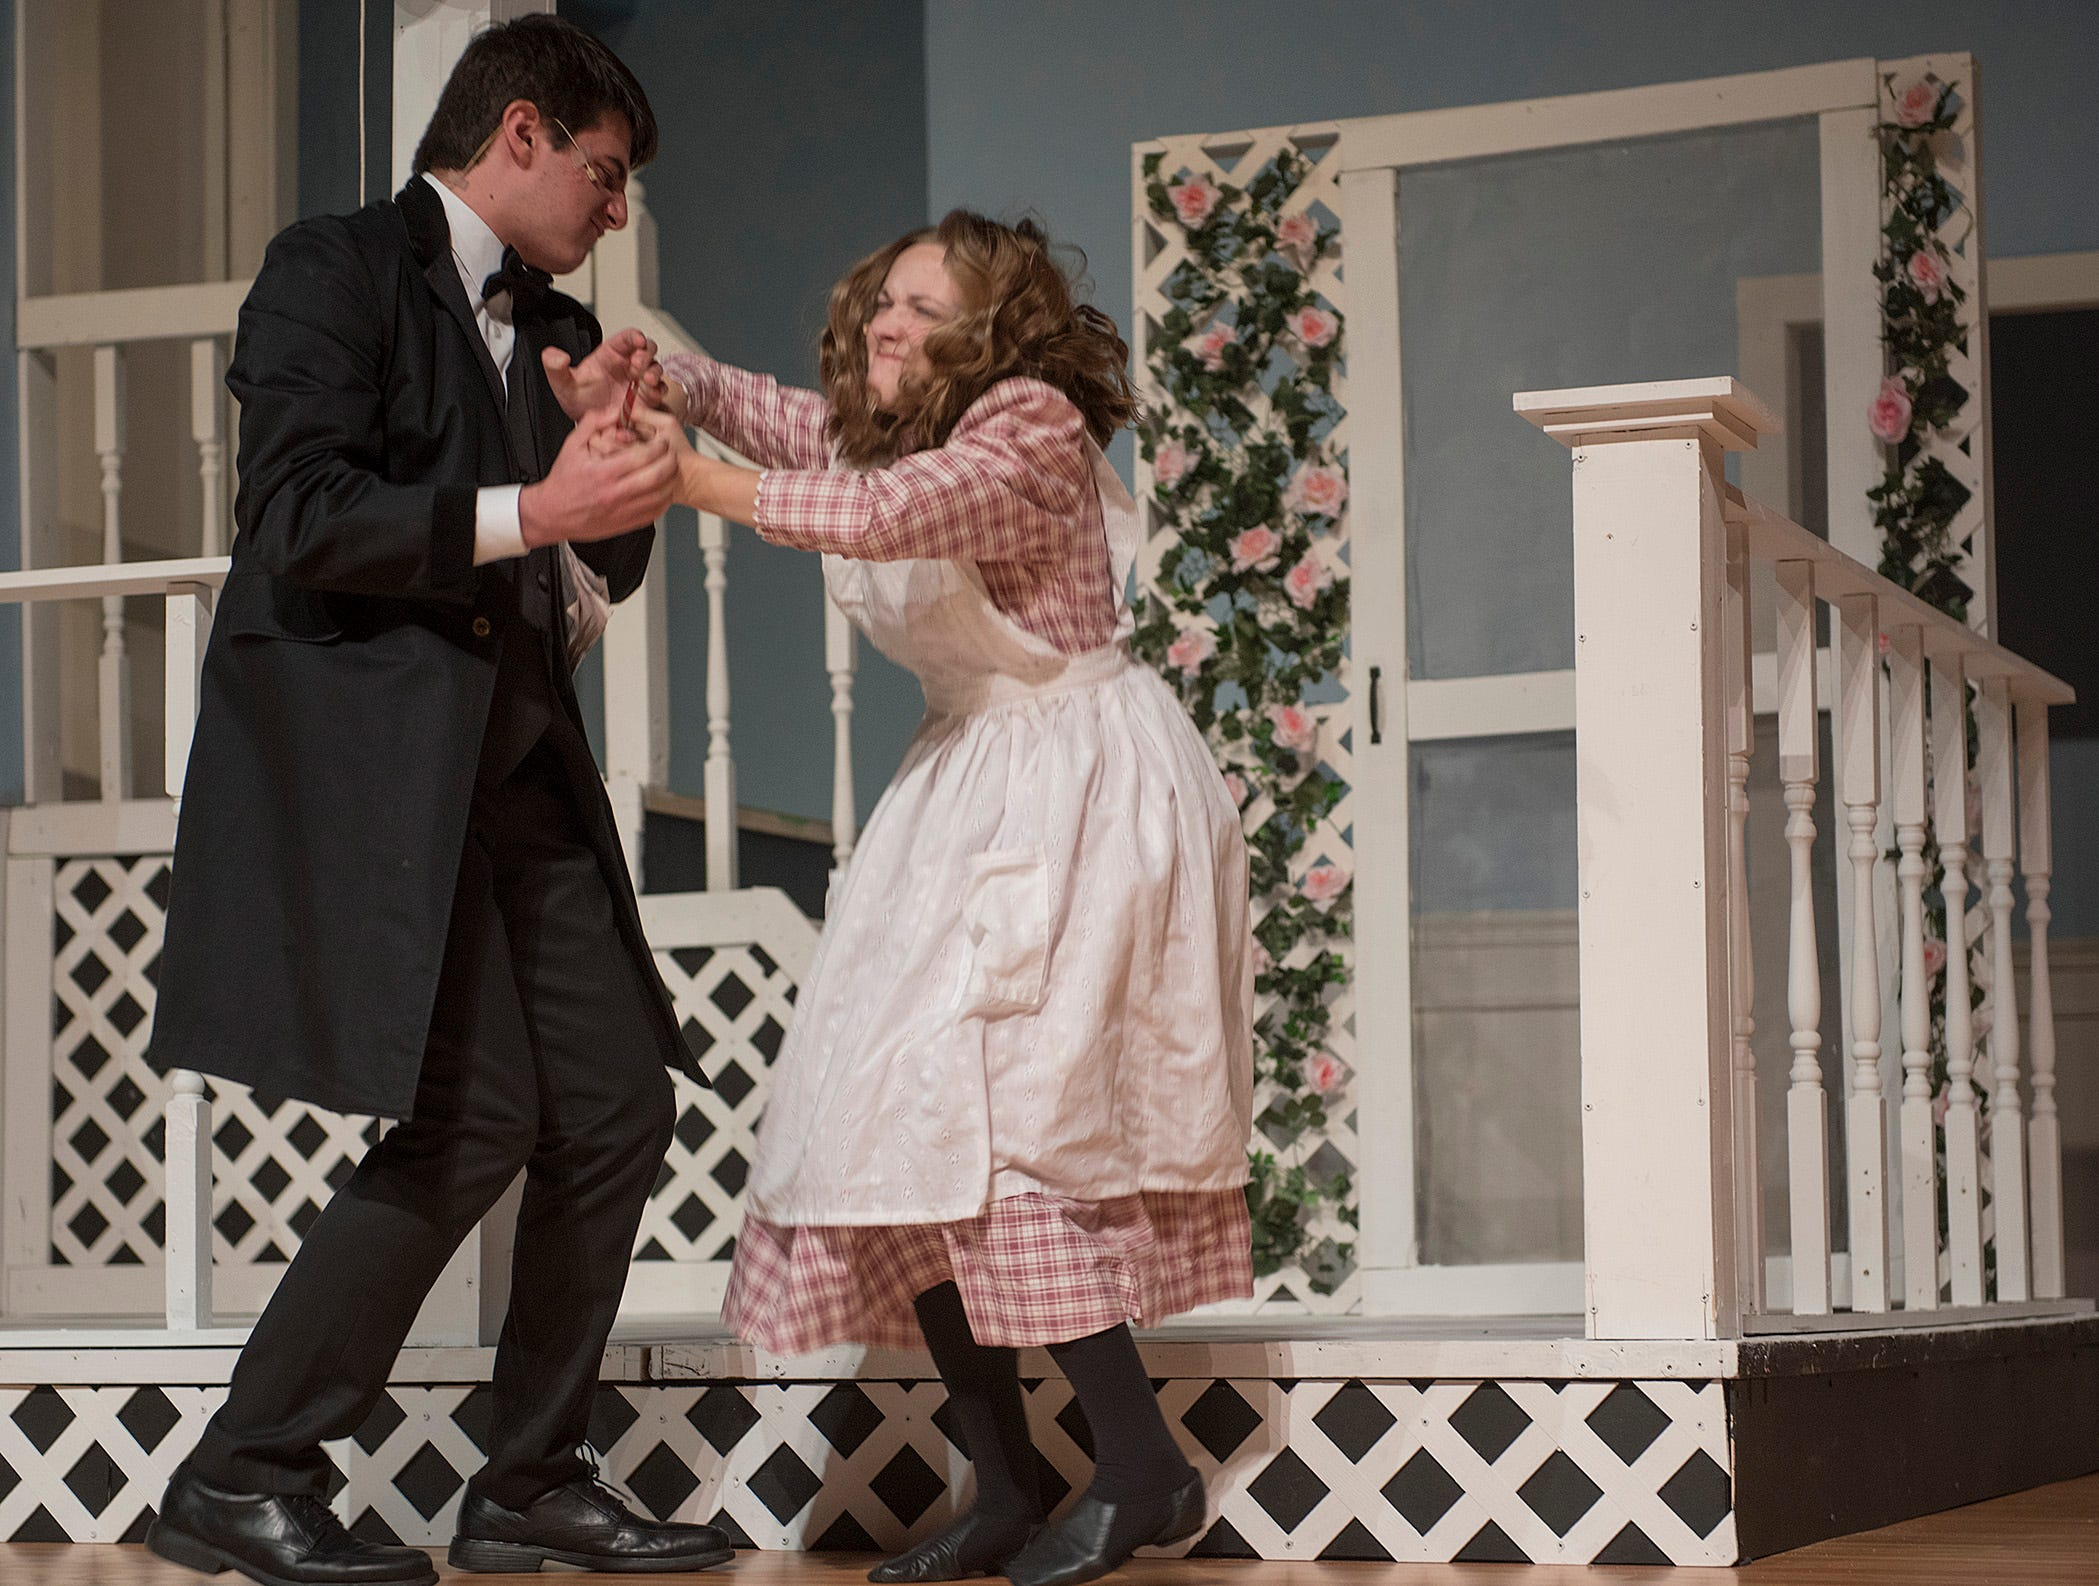 Captain Keller (Charles Hilu) can't control his daughter Helen (Jillian Bocketti), just like everyone else in the family.